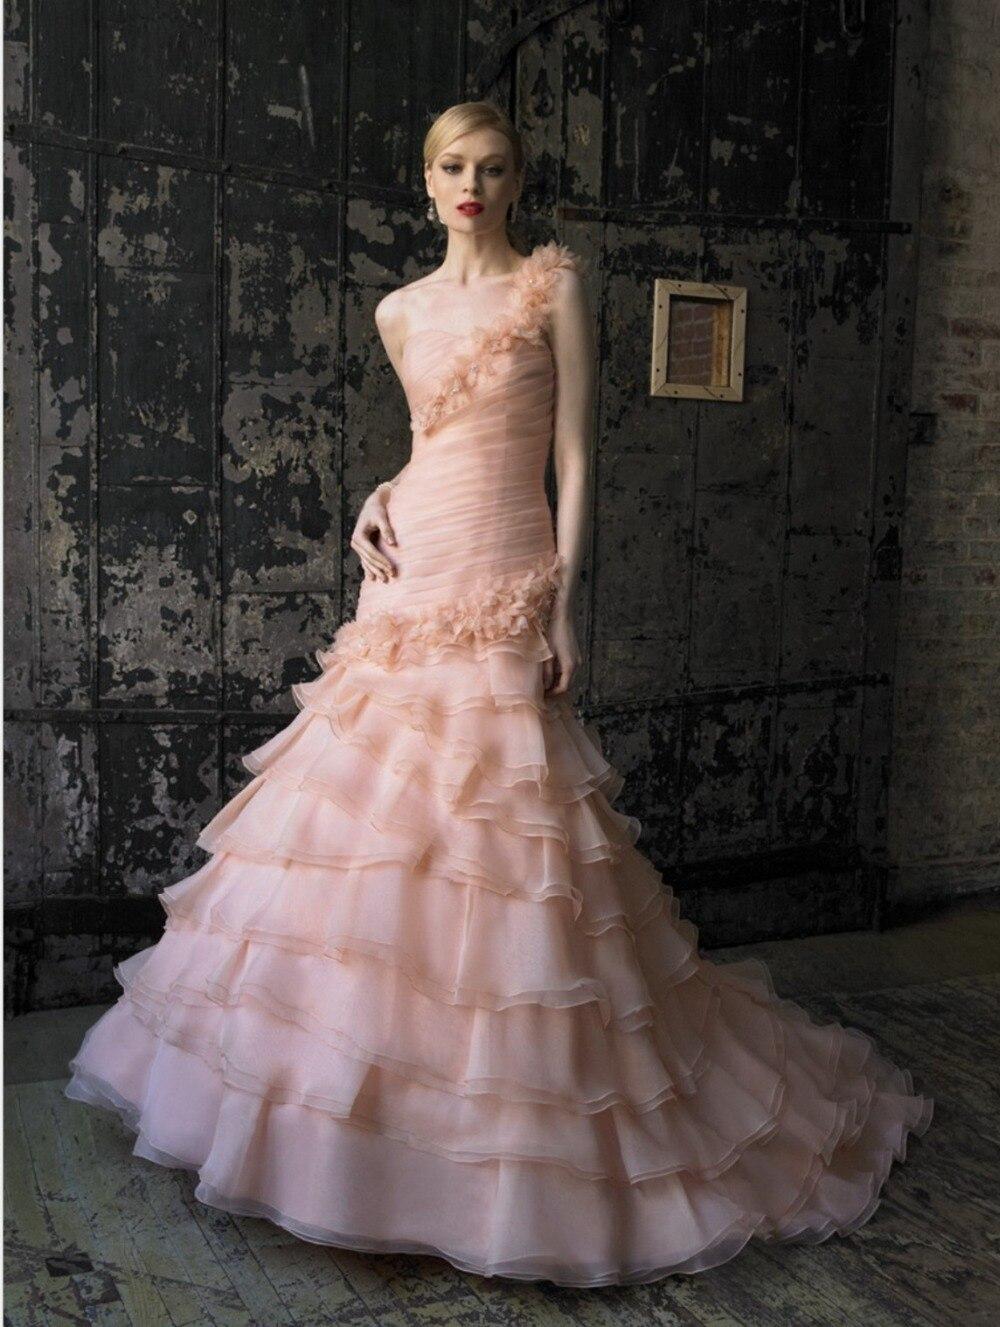 wedding dresses with ruffles ruffle wedding dress wedding dress with ruffles design your wedding dress